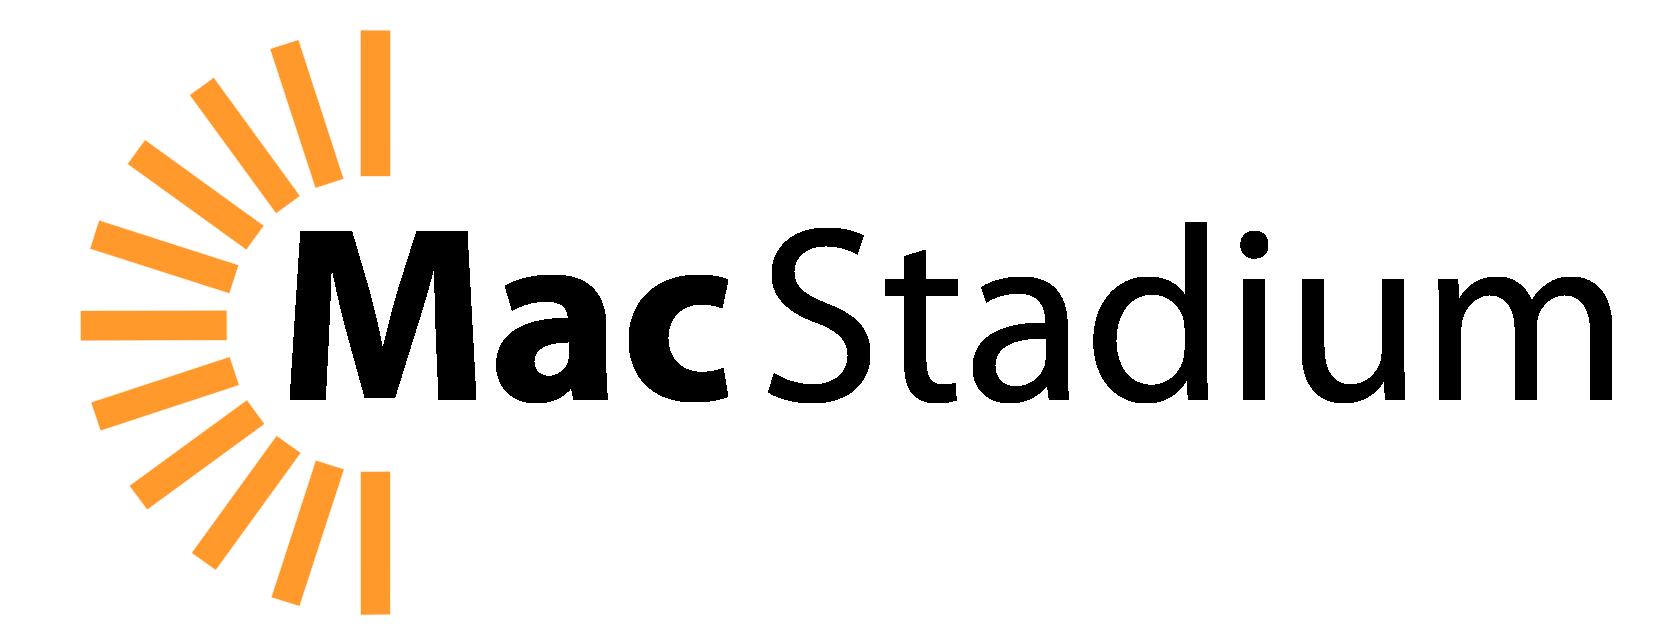 MacStadium logo